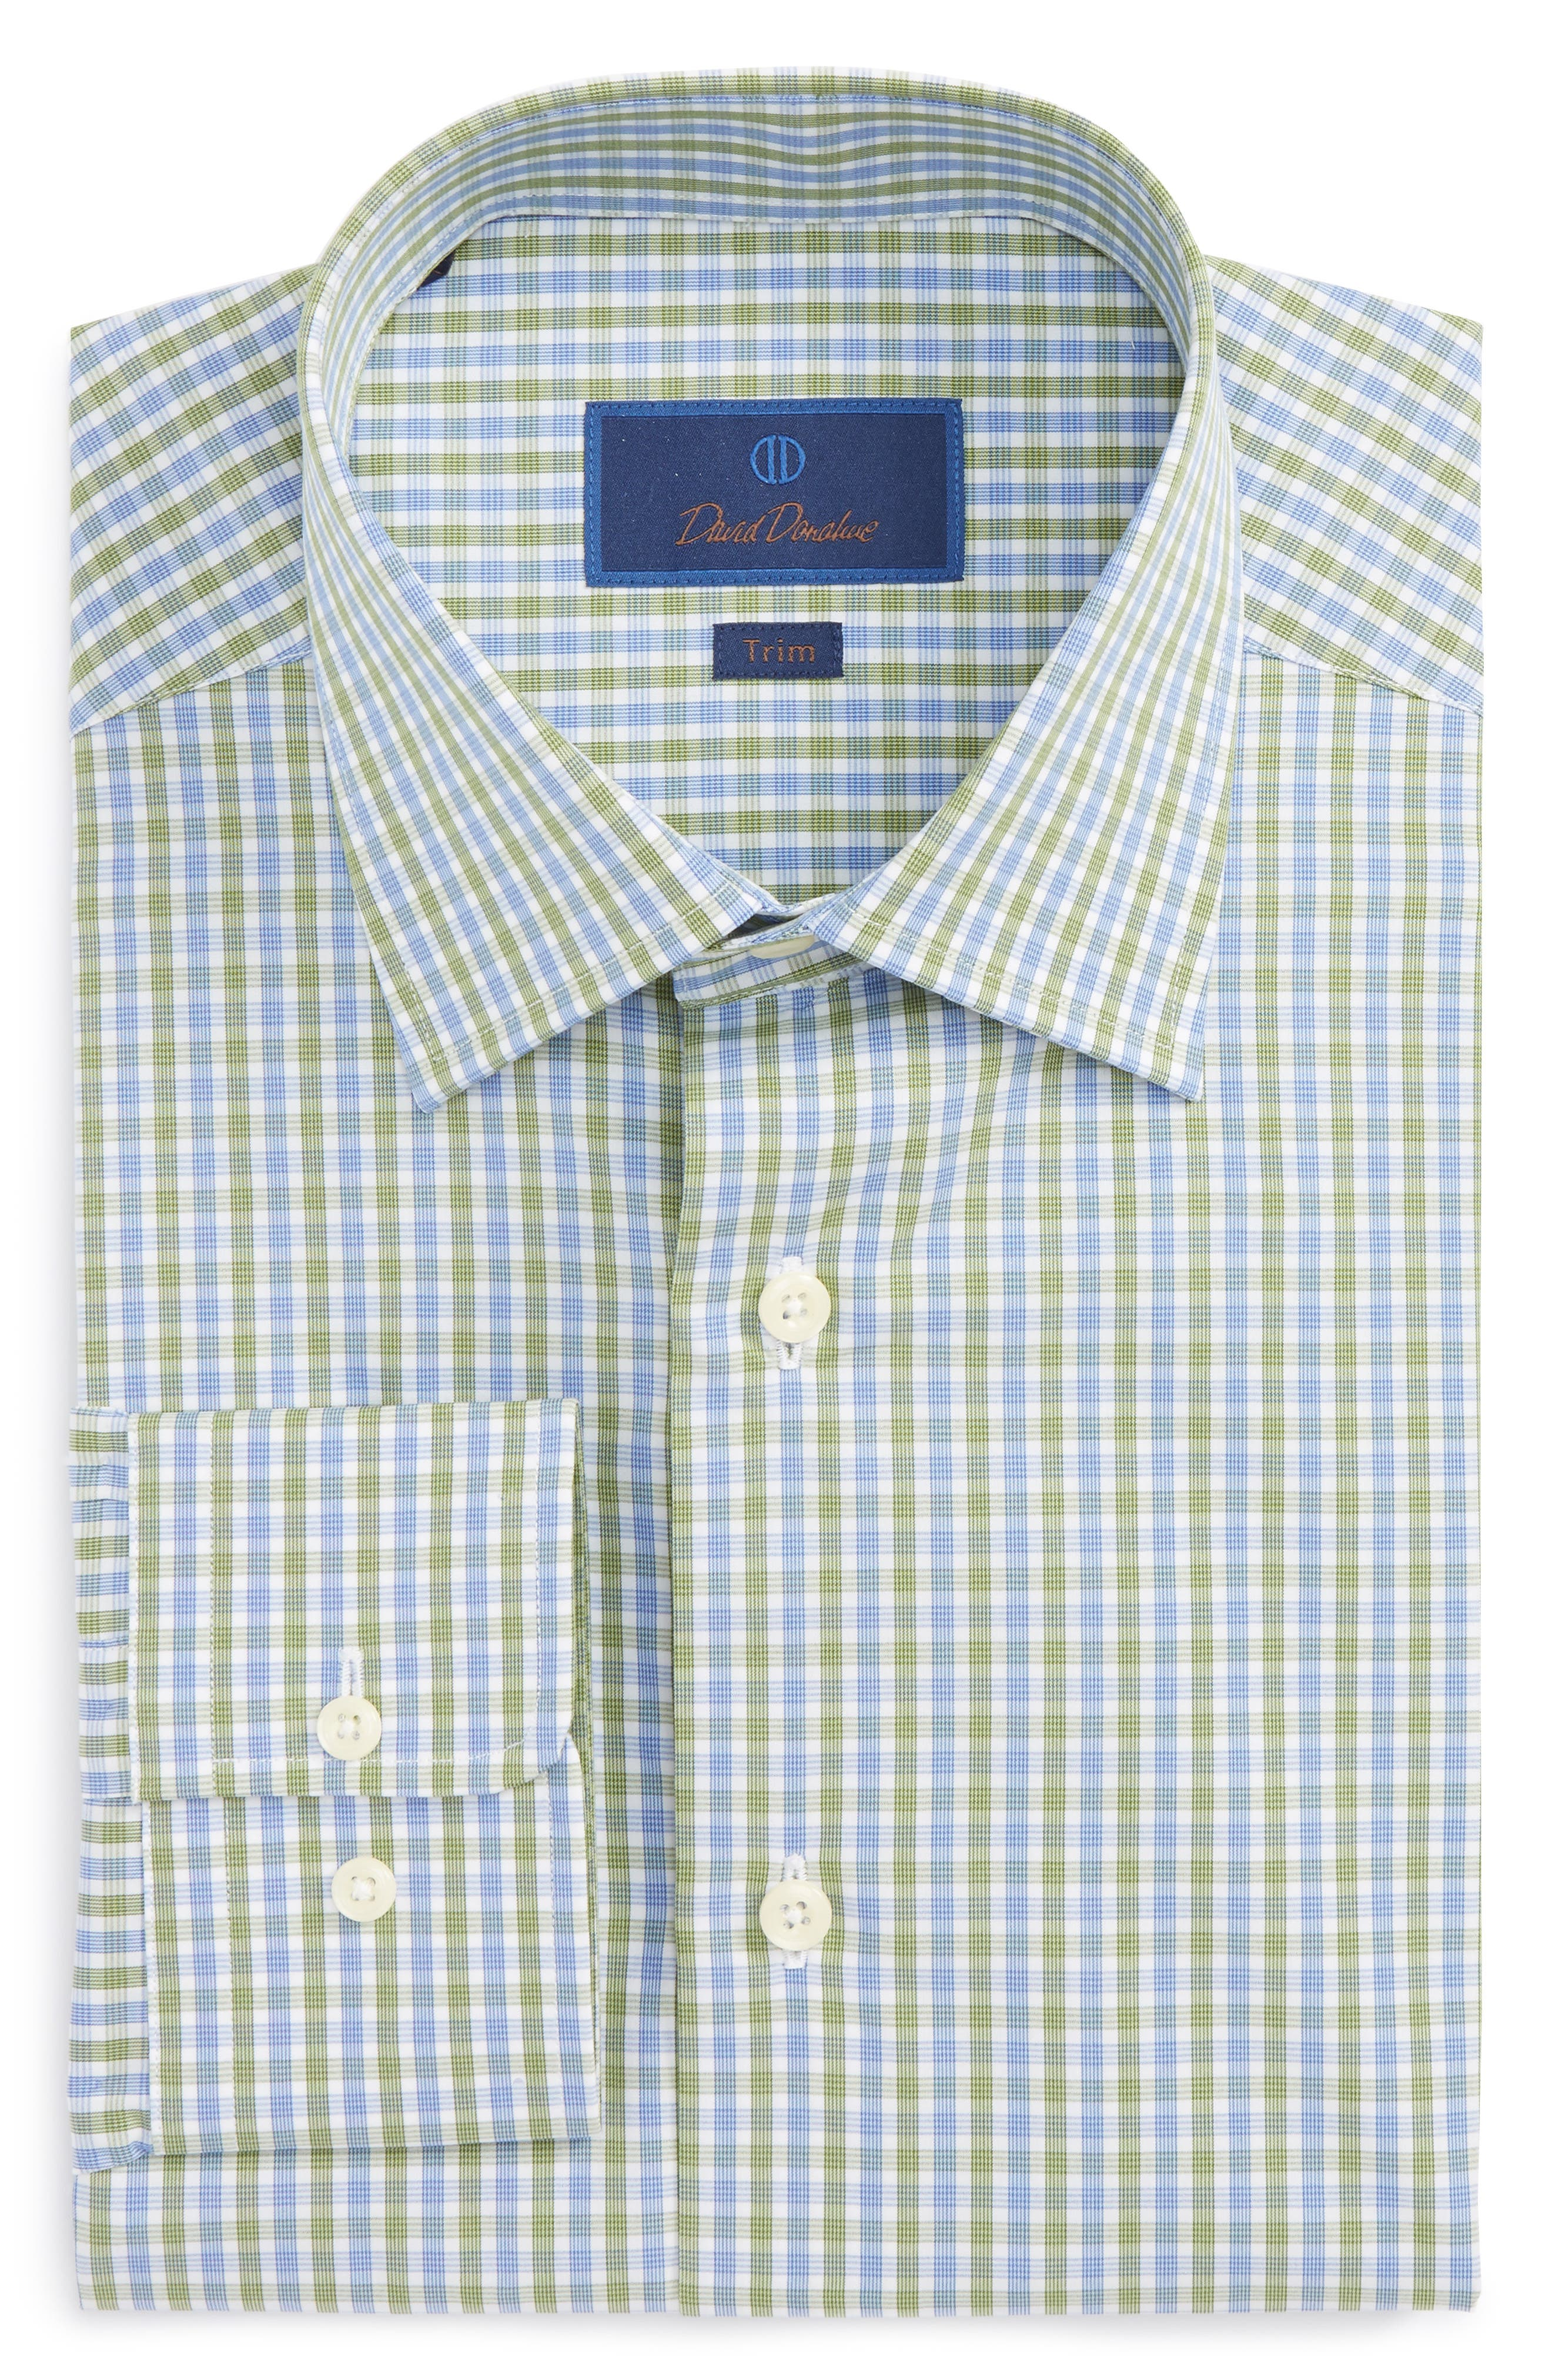 Main Image - David Donahue Trim Fit Check Dress Shirt